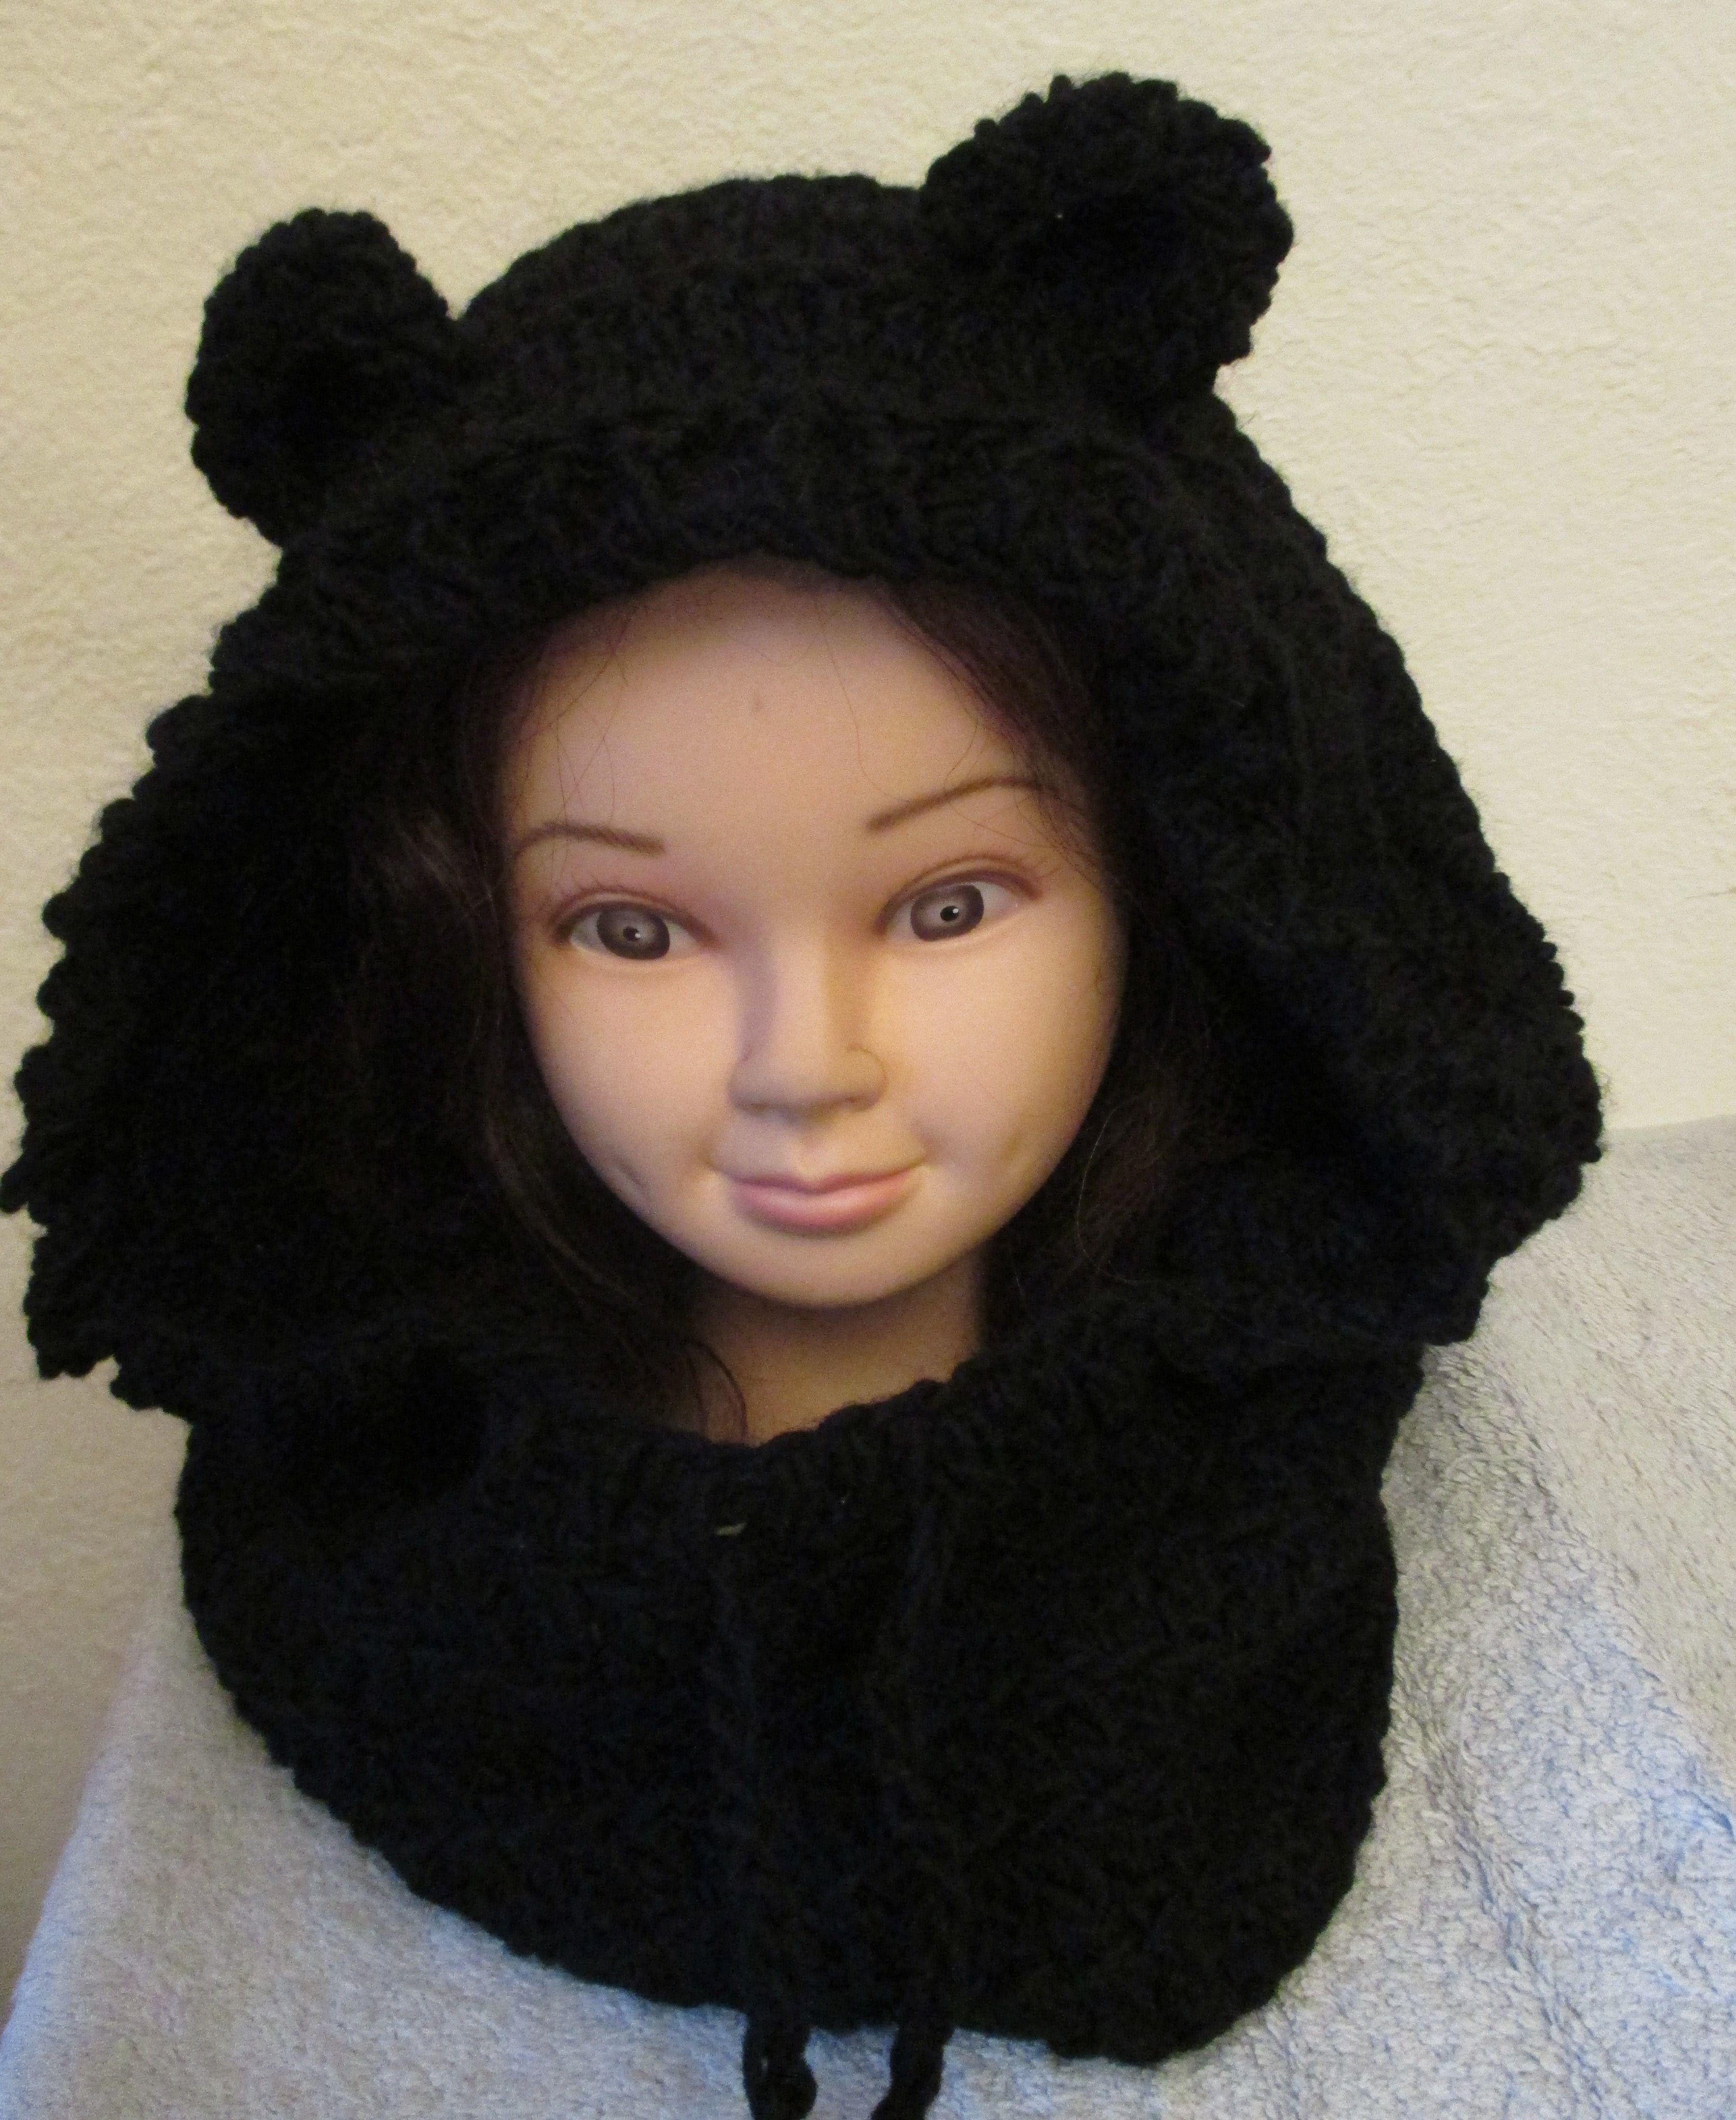 Kapuze Hoodie Bärenohren Häkeln Mützen